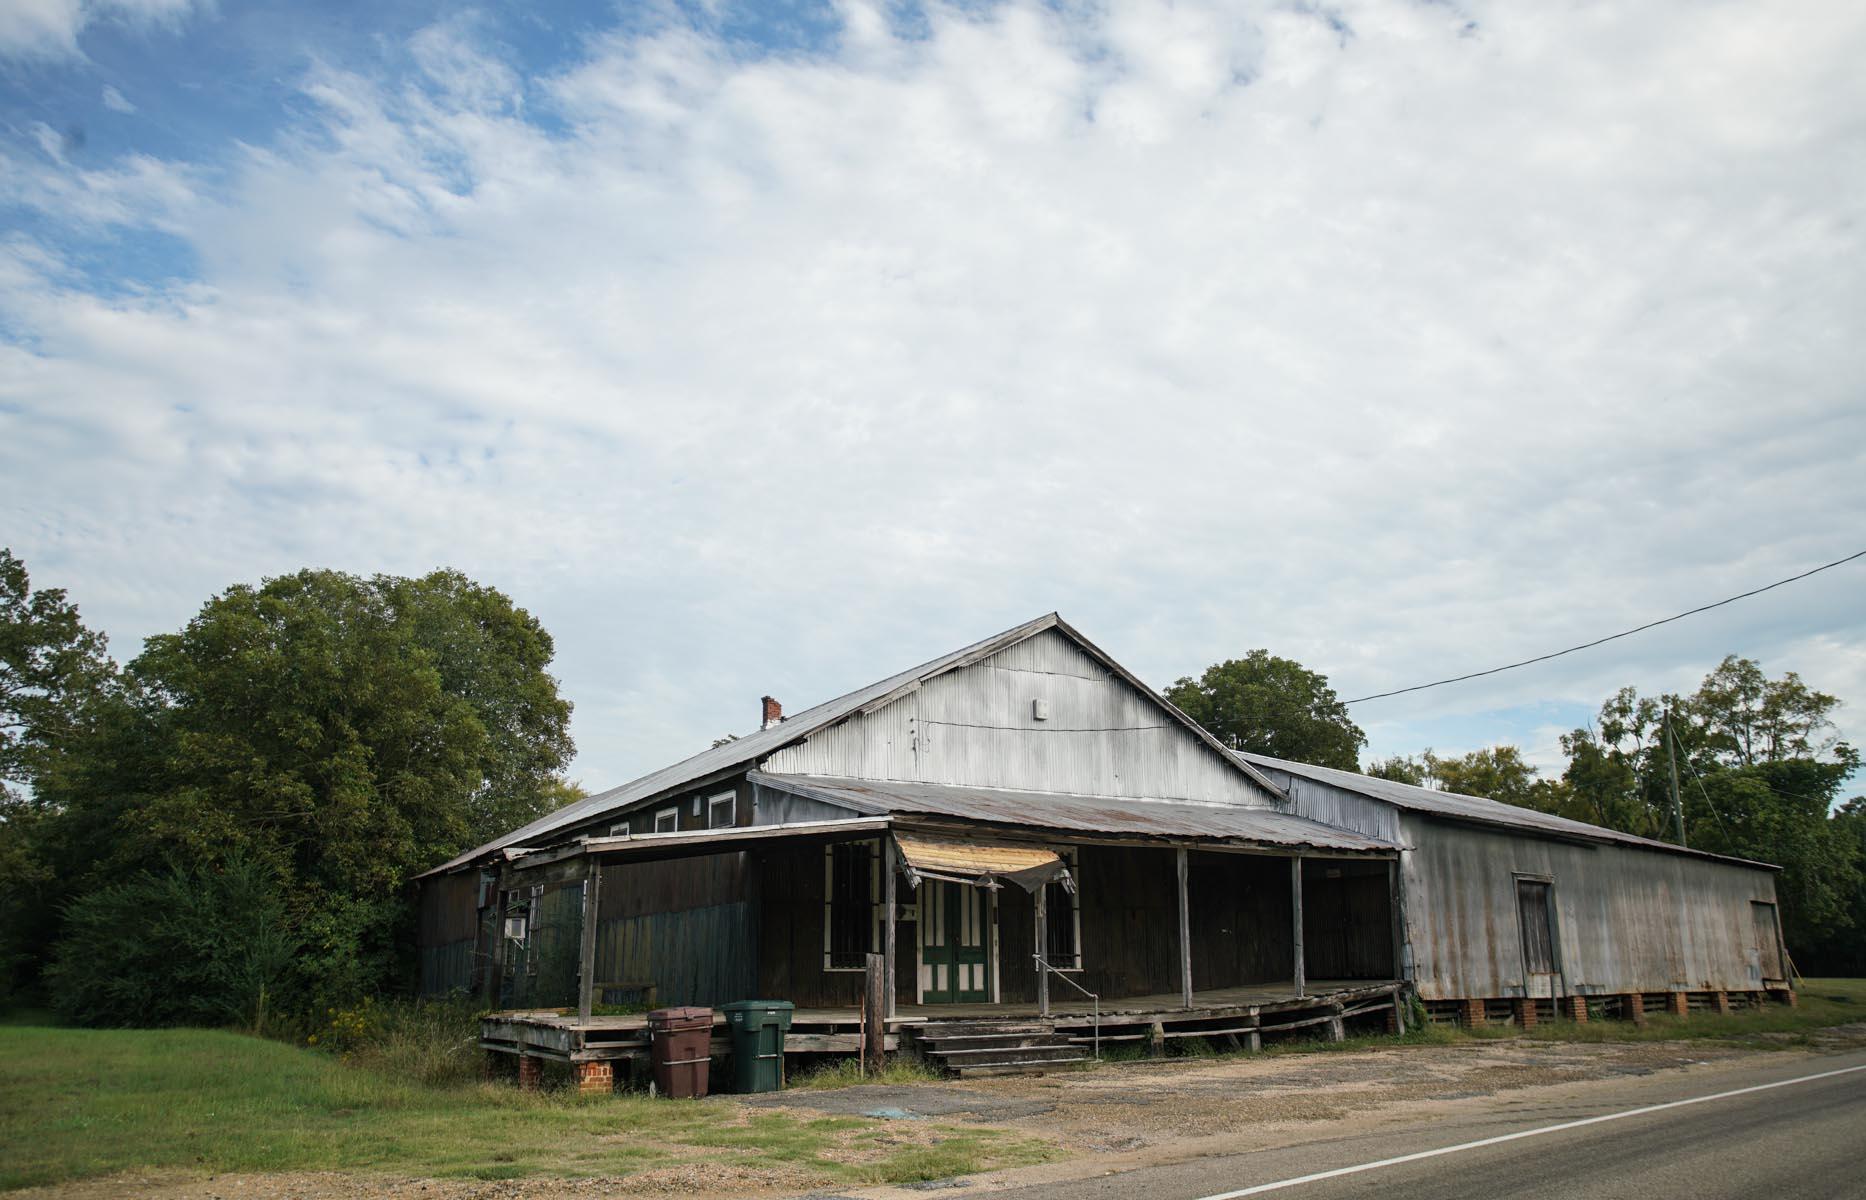 RA_hale county vernacular-07029.jpg